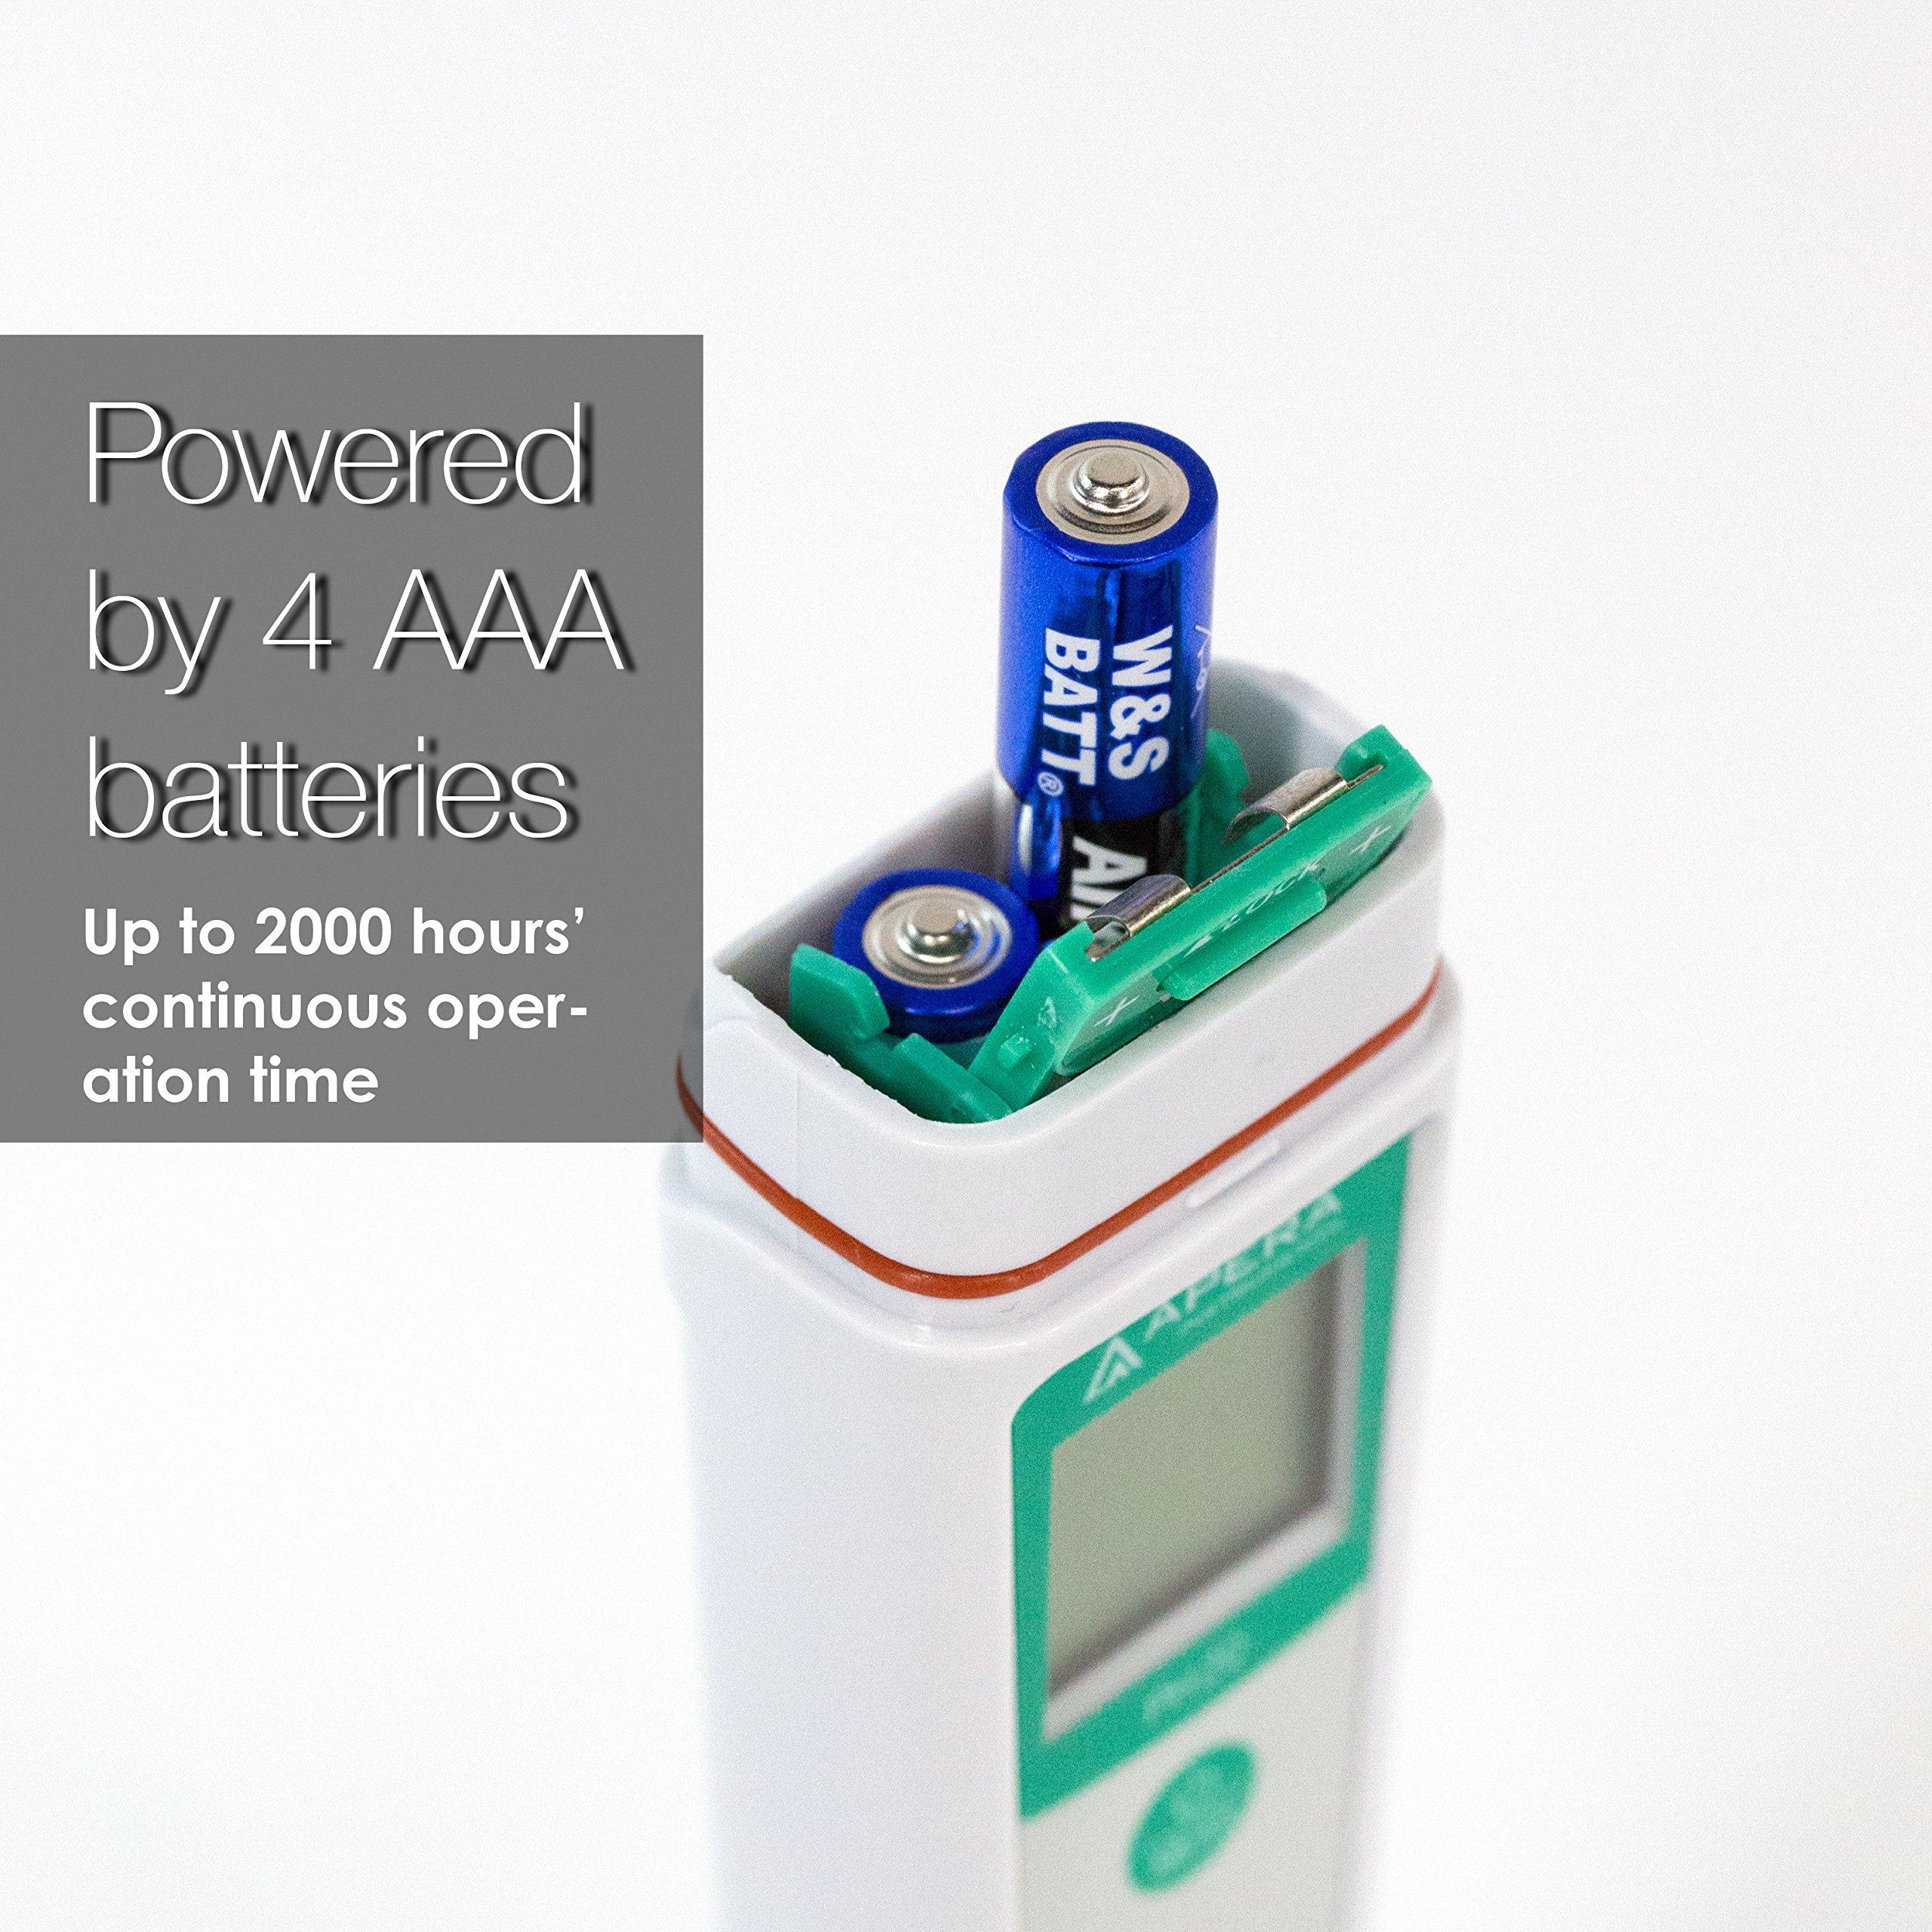 Apera Instruments AI209 PH20 Value Waterproof pH Pocket Tester, ±0.1 pH Accuracy, 0-14.0 pH Range, Complete Kit by Apera Instruments, LLC (Image #6)